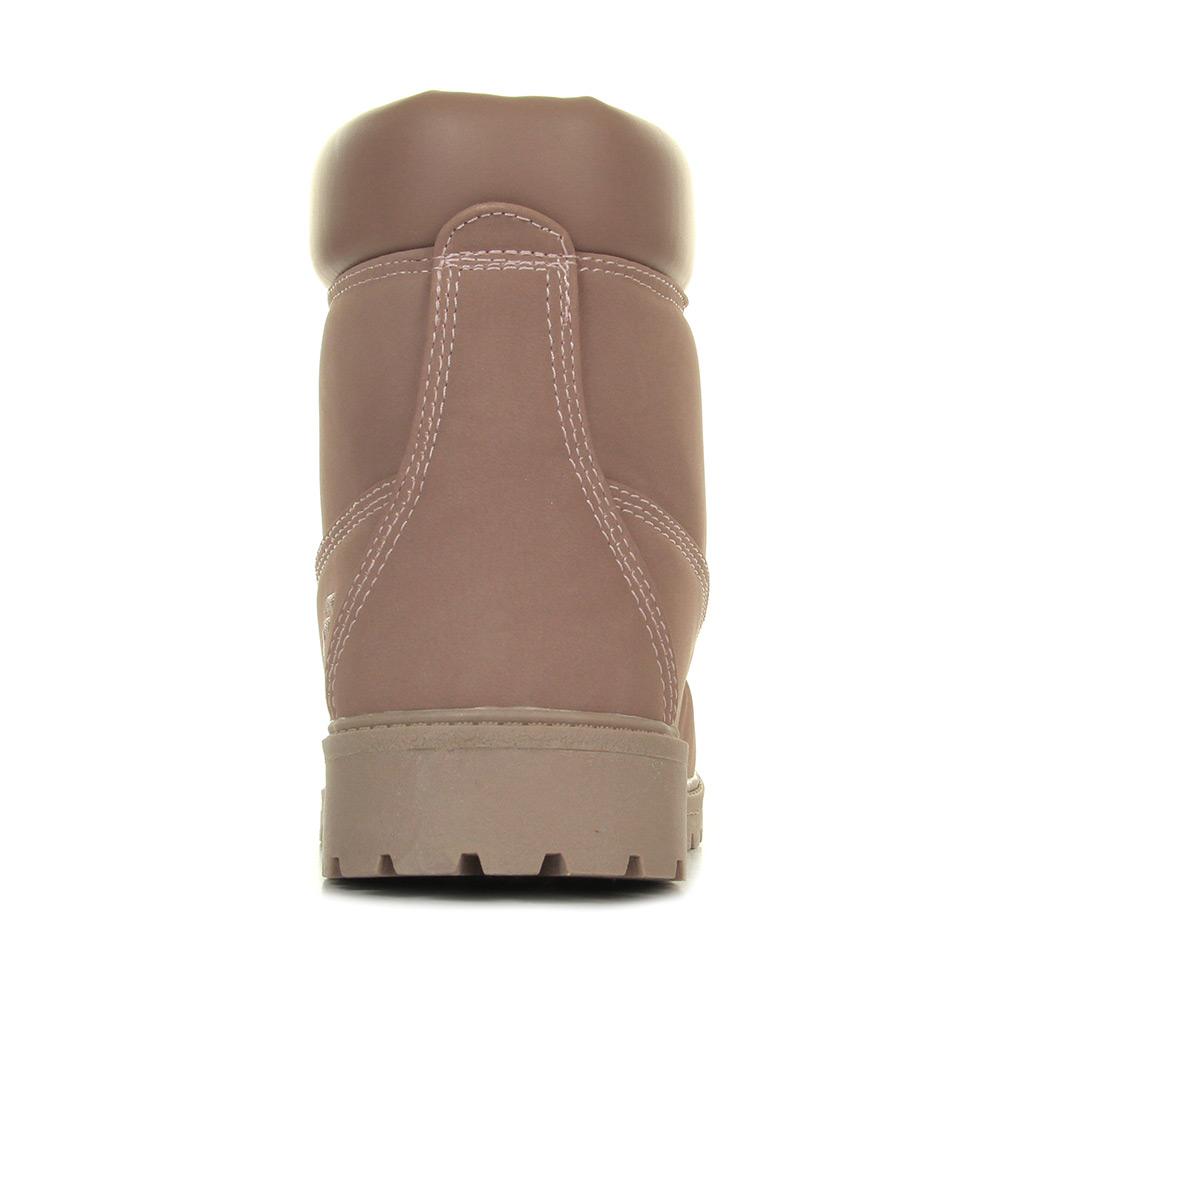 Wmn Maverick Femme Mid Boots Woodrose Fila 101019670h 1P0nxO0T